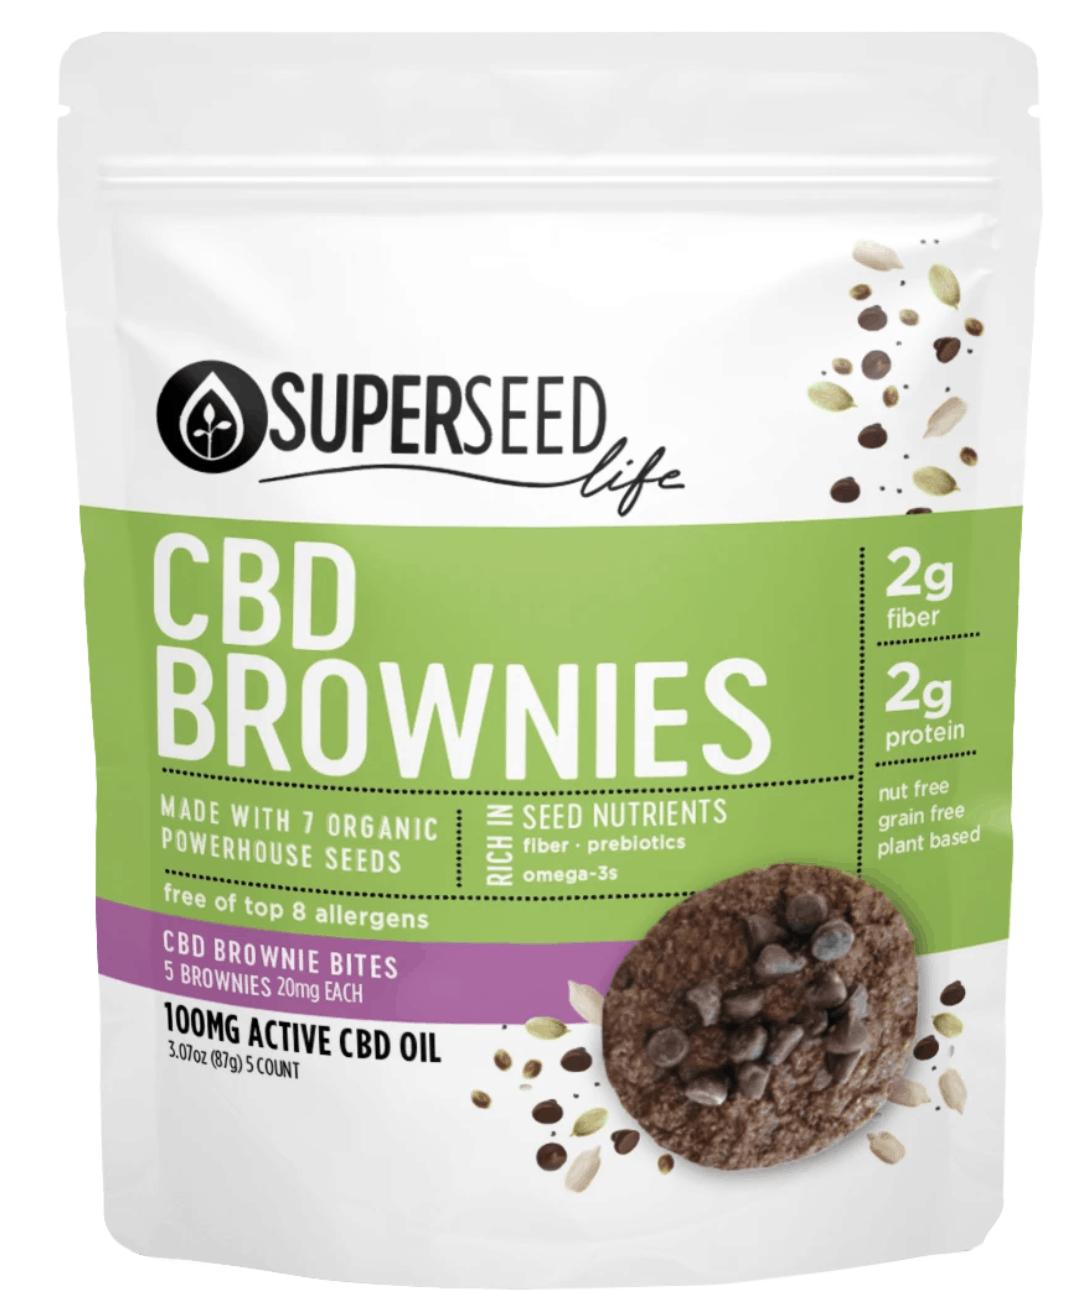 SuperSeed CBD Brownies